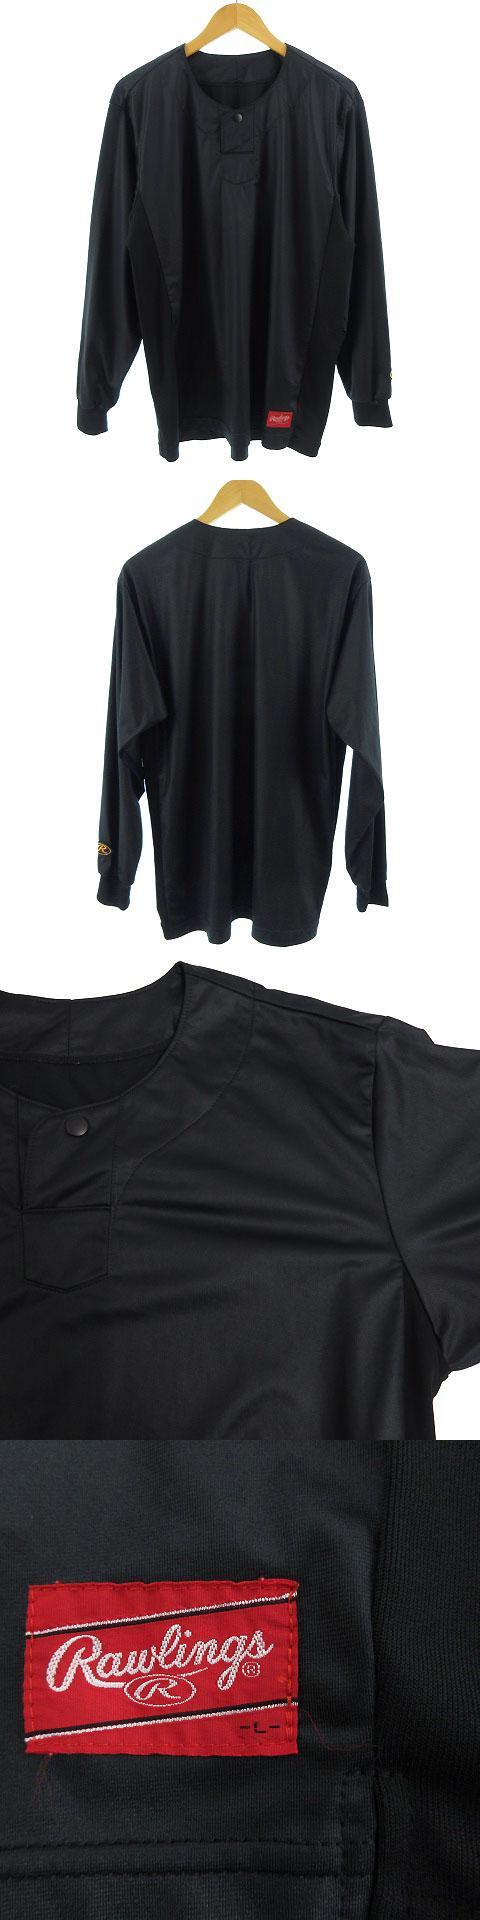 Rawlings ベースボール シャツ アンダーシャツ 長袖 野球 ブラック 黒 L